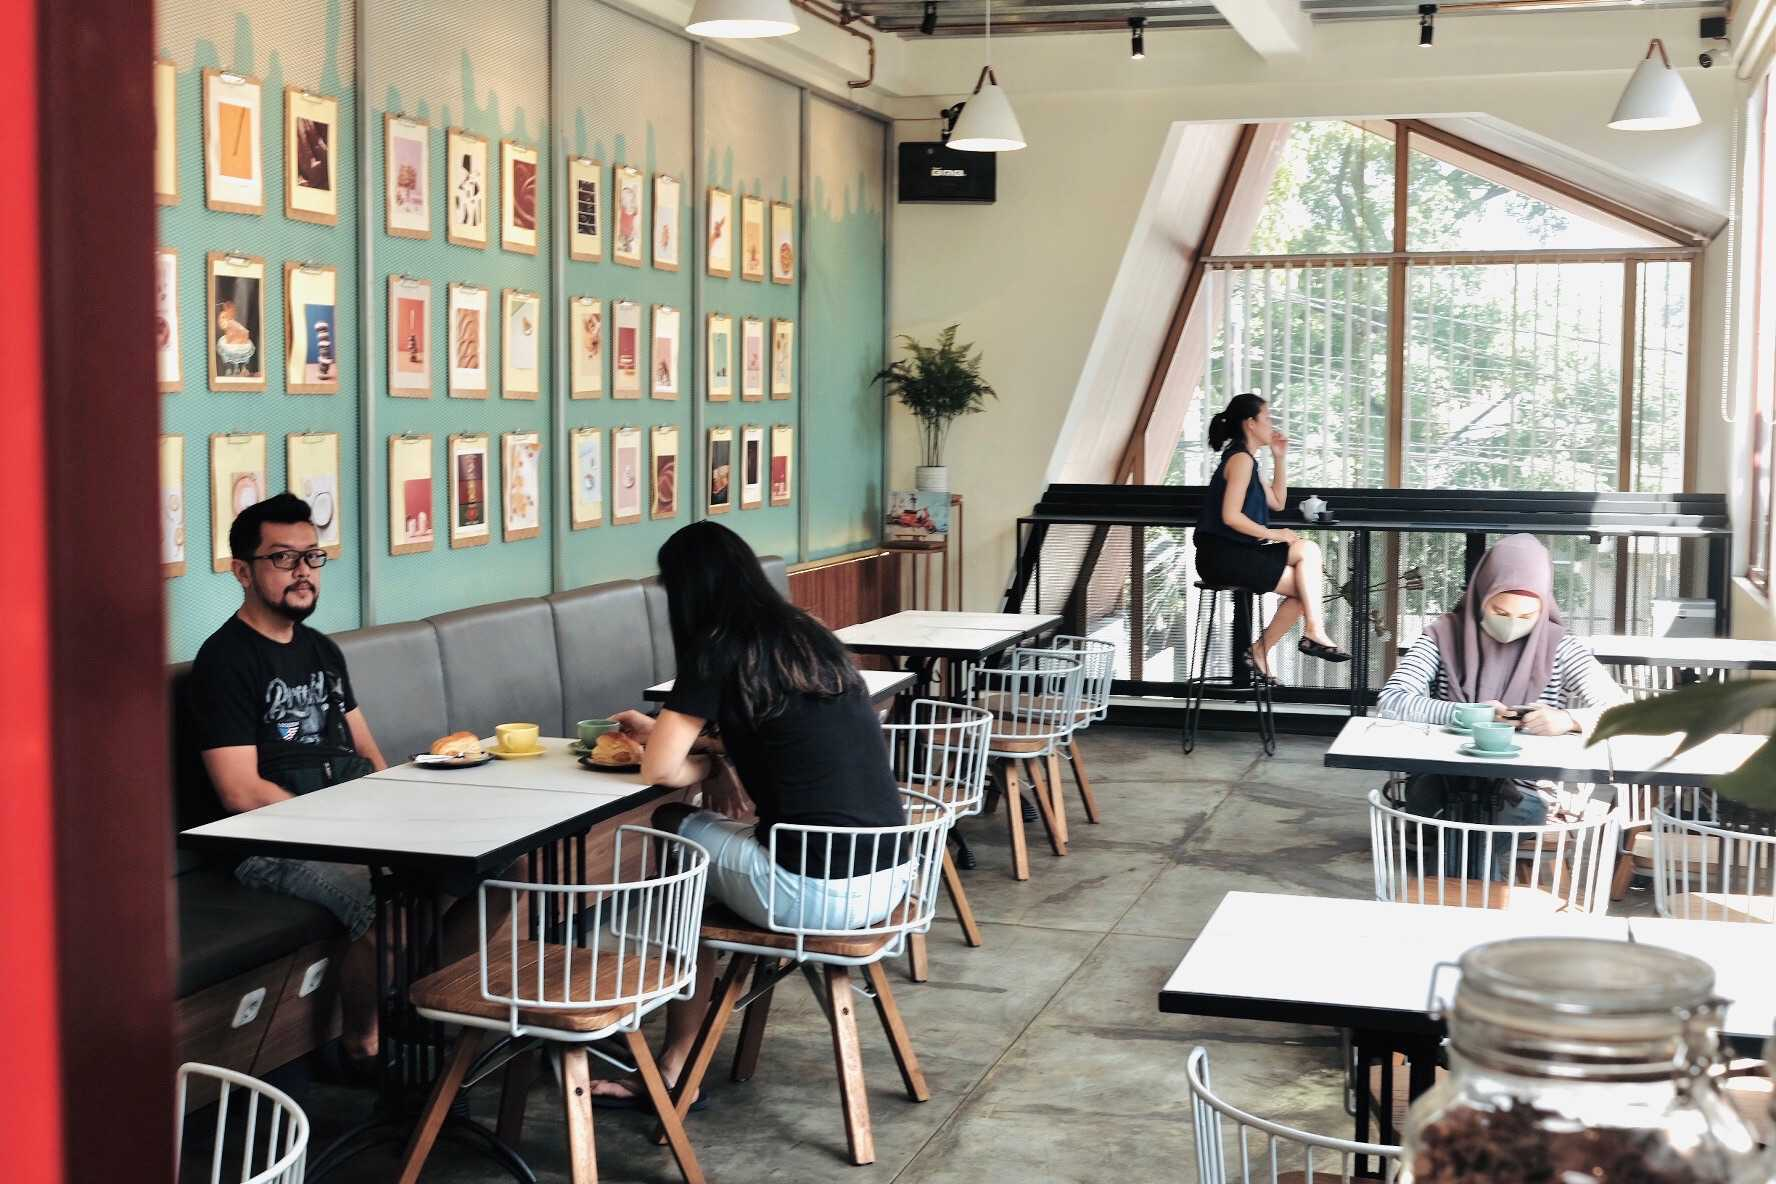 Dinardithen Studio Industrial Bakery House And Coffe At Paskal Bandung, Kota Bandung, Jawa Barat, Indonesia Bandung, Kota Bandung, Jawa Barat, Indonesia Dinardithen-Studio-Industrial-Bakery-House-And-Coffe-At-Paskal  127171